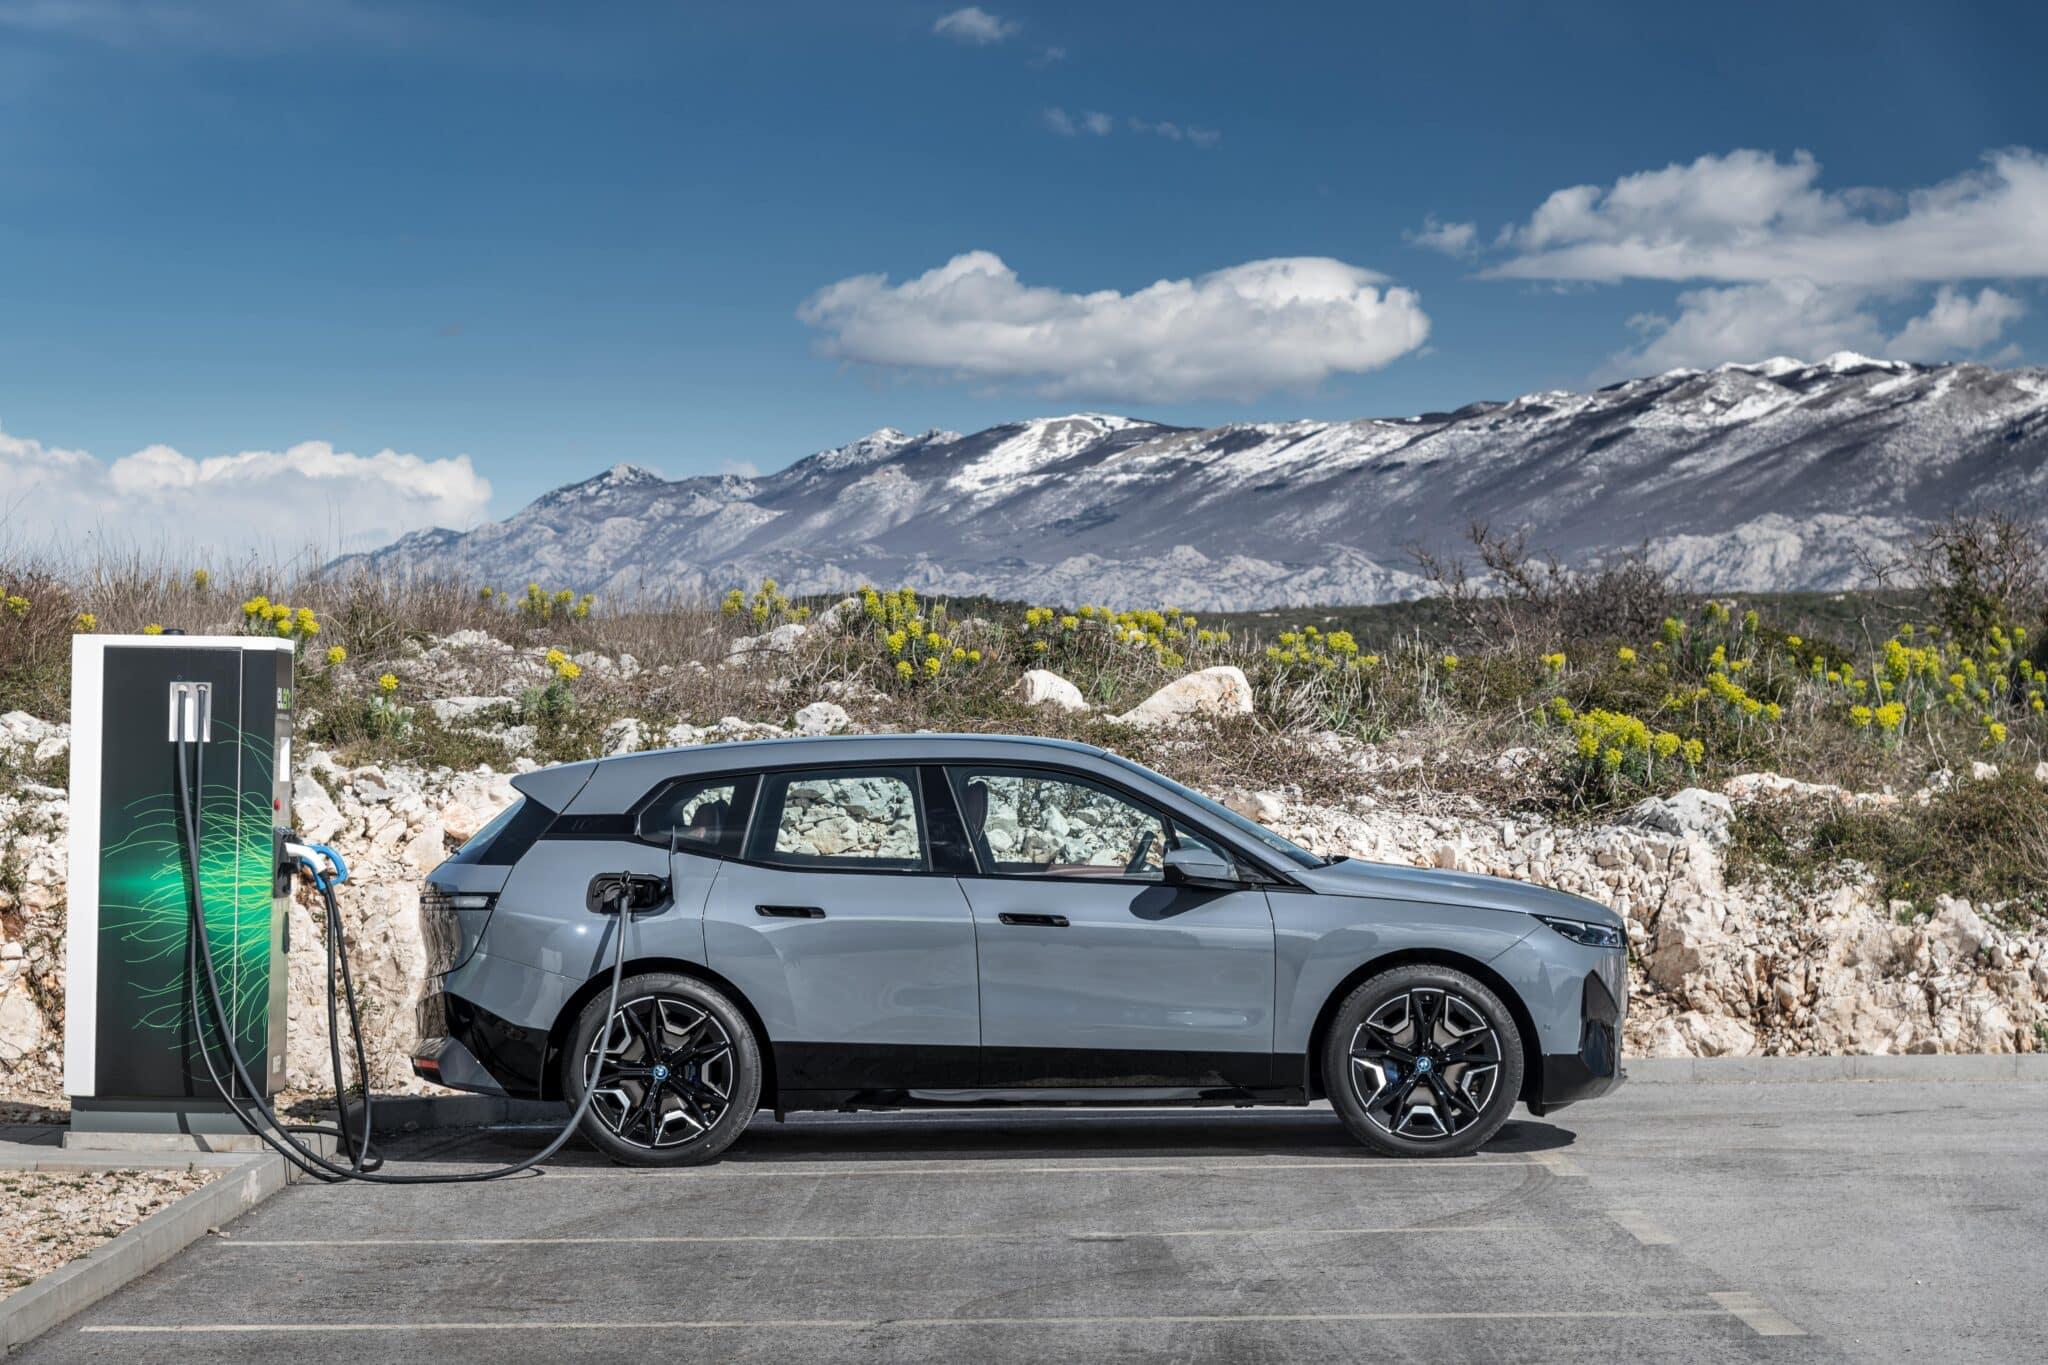 Der erste BMW iX. | P90422144 highRes the bmw ix xdrive50 min scaled